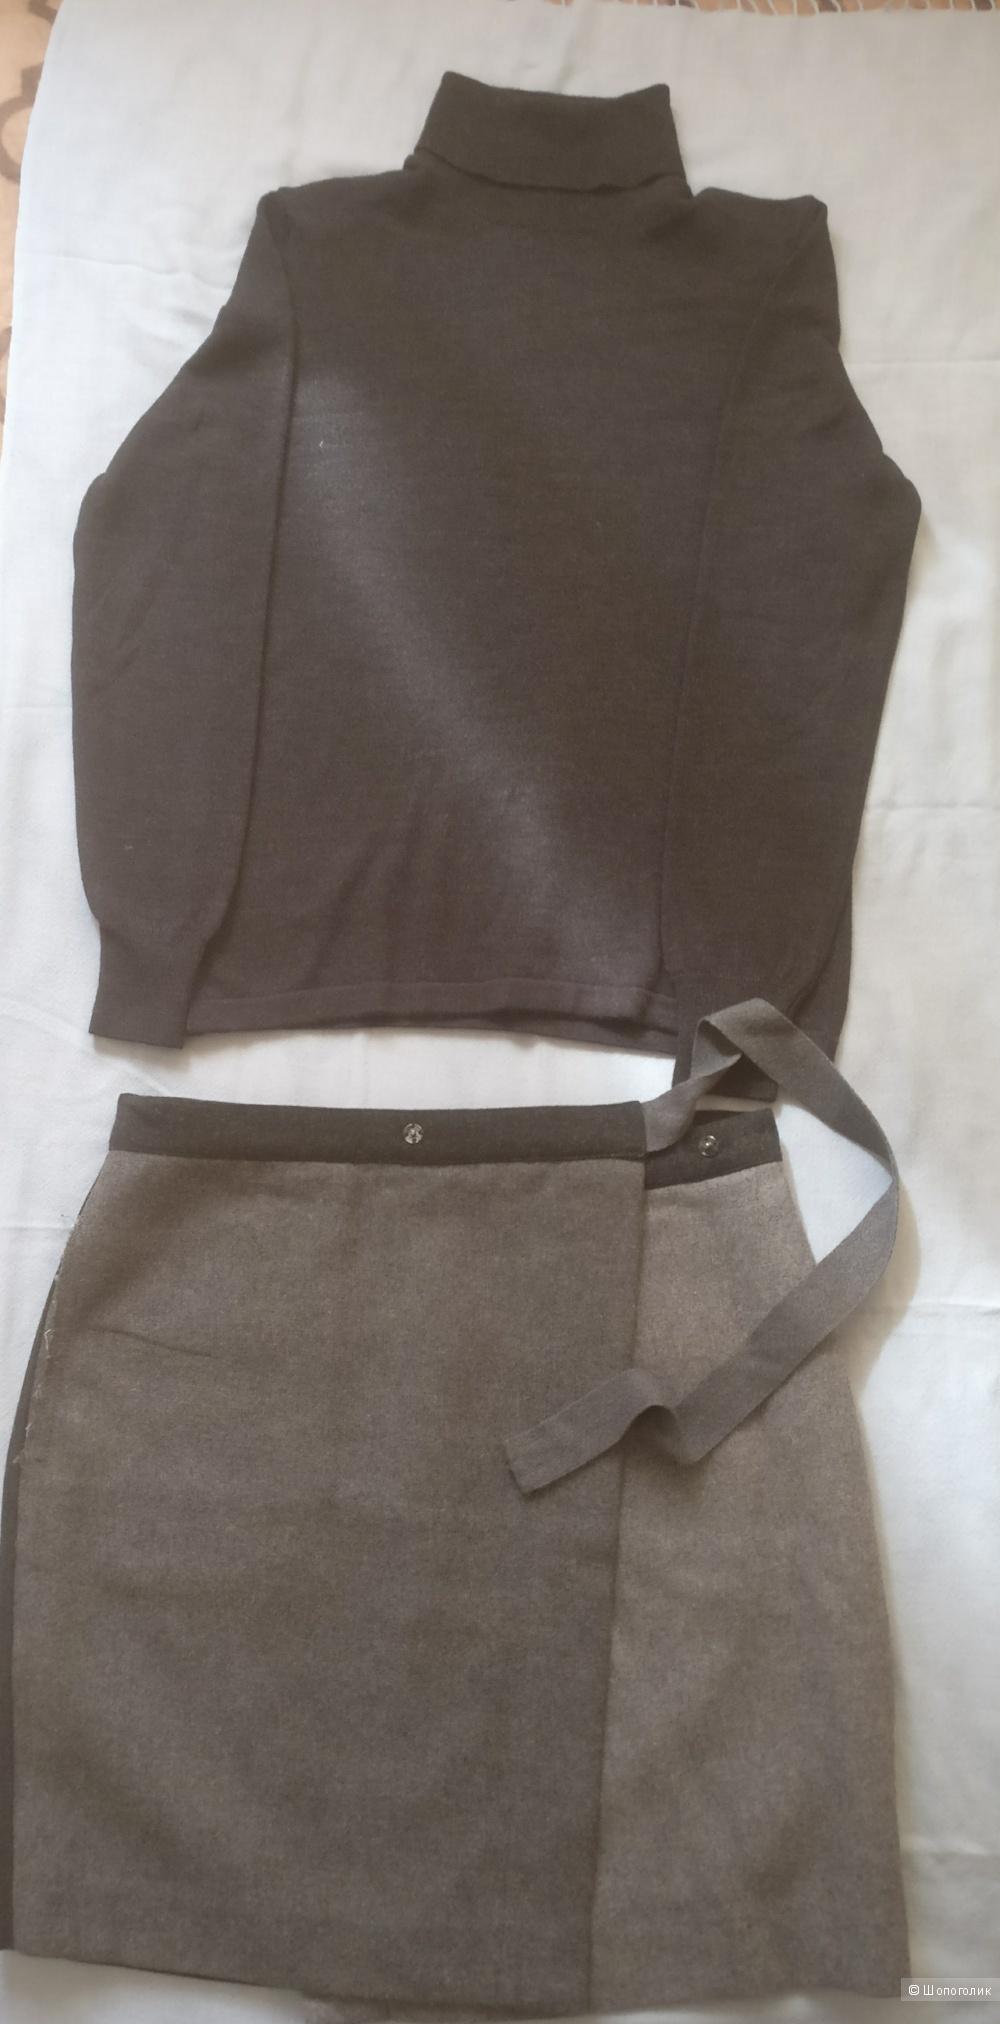 Комплект - Дизайнерская юбка Loft и водолазка Mazenetto, размер s